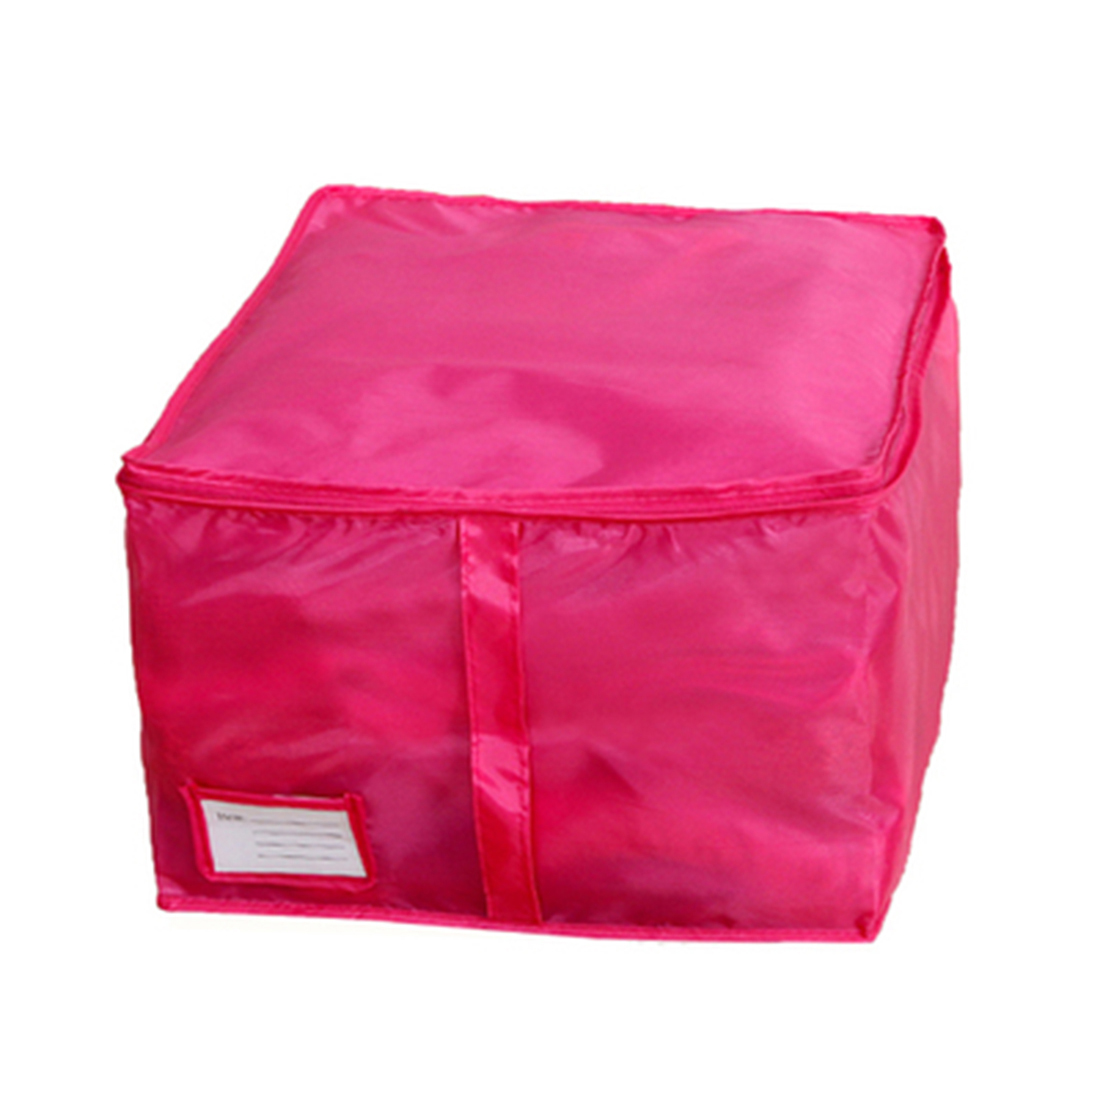 Folding Zippered Clothes Bed Sheet Quilt Duvet Storage Bag Holder Container Blue